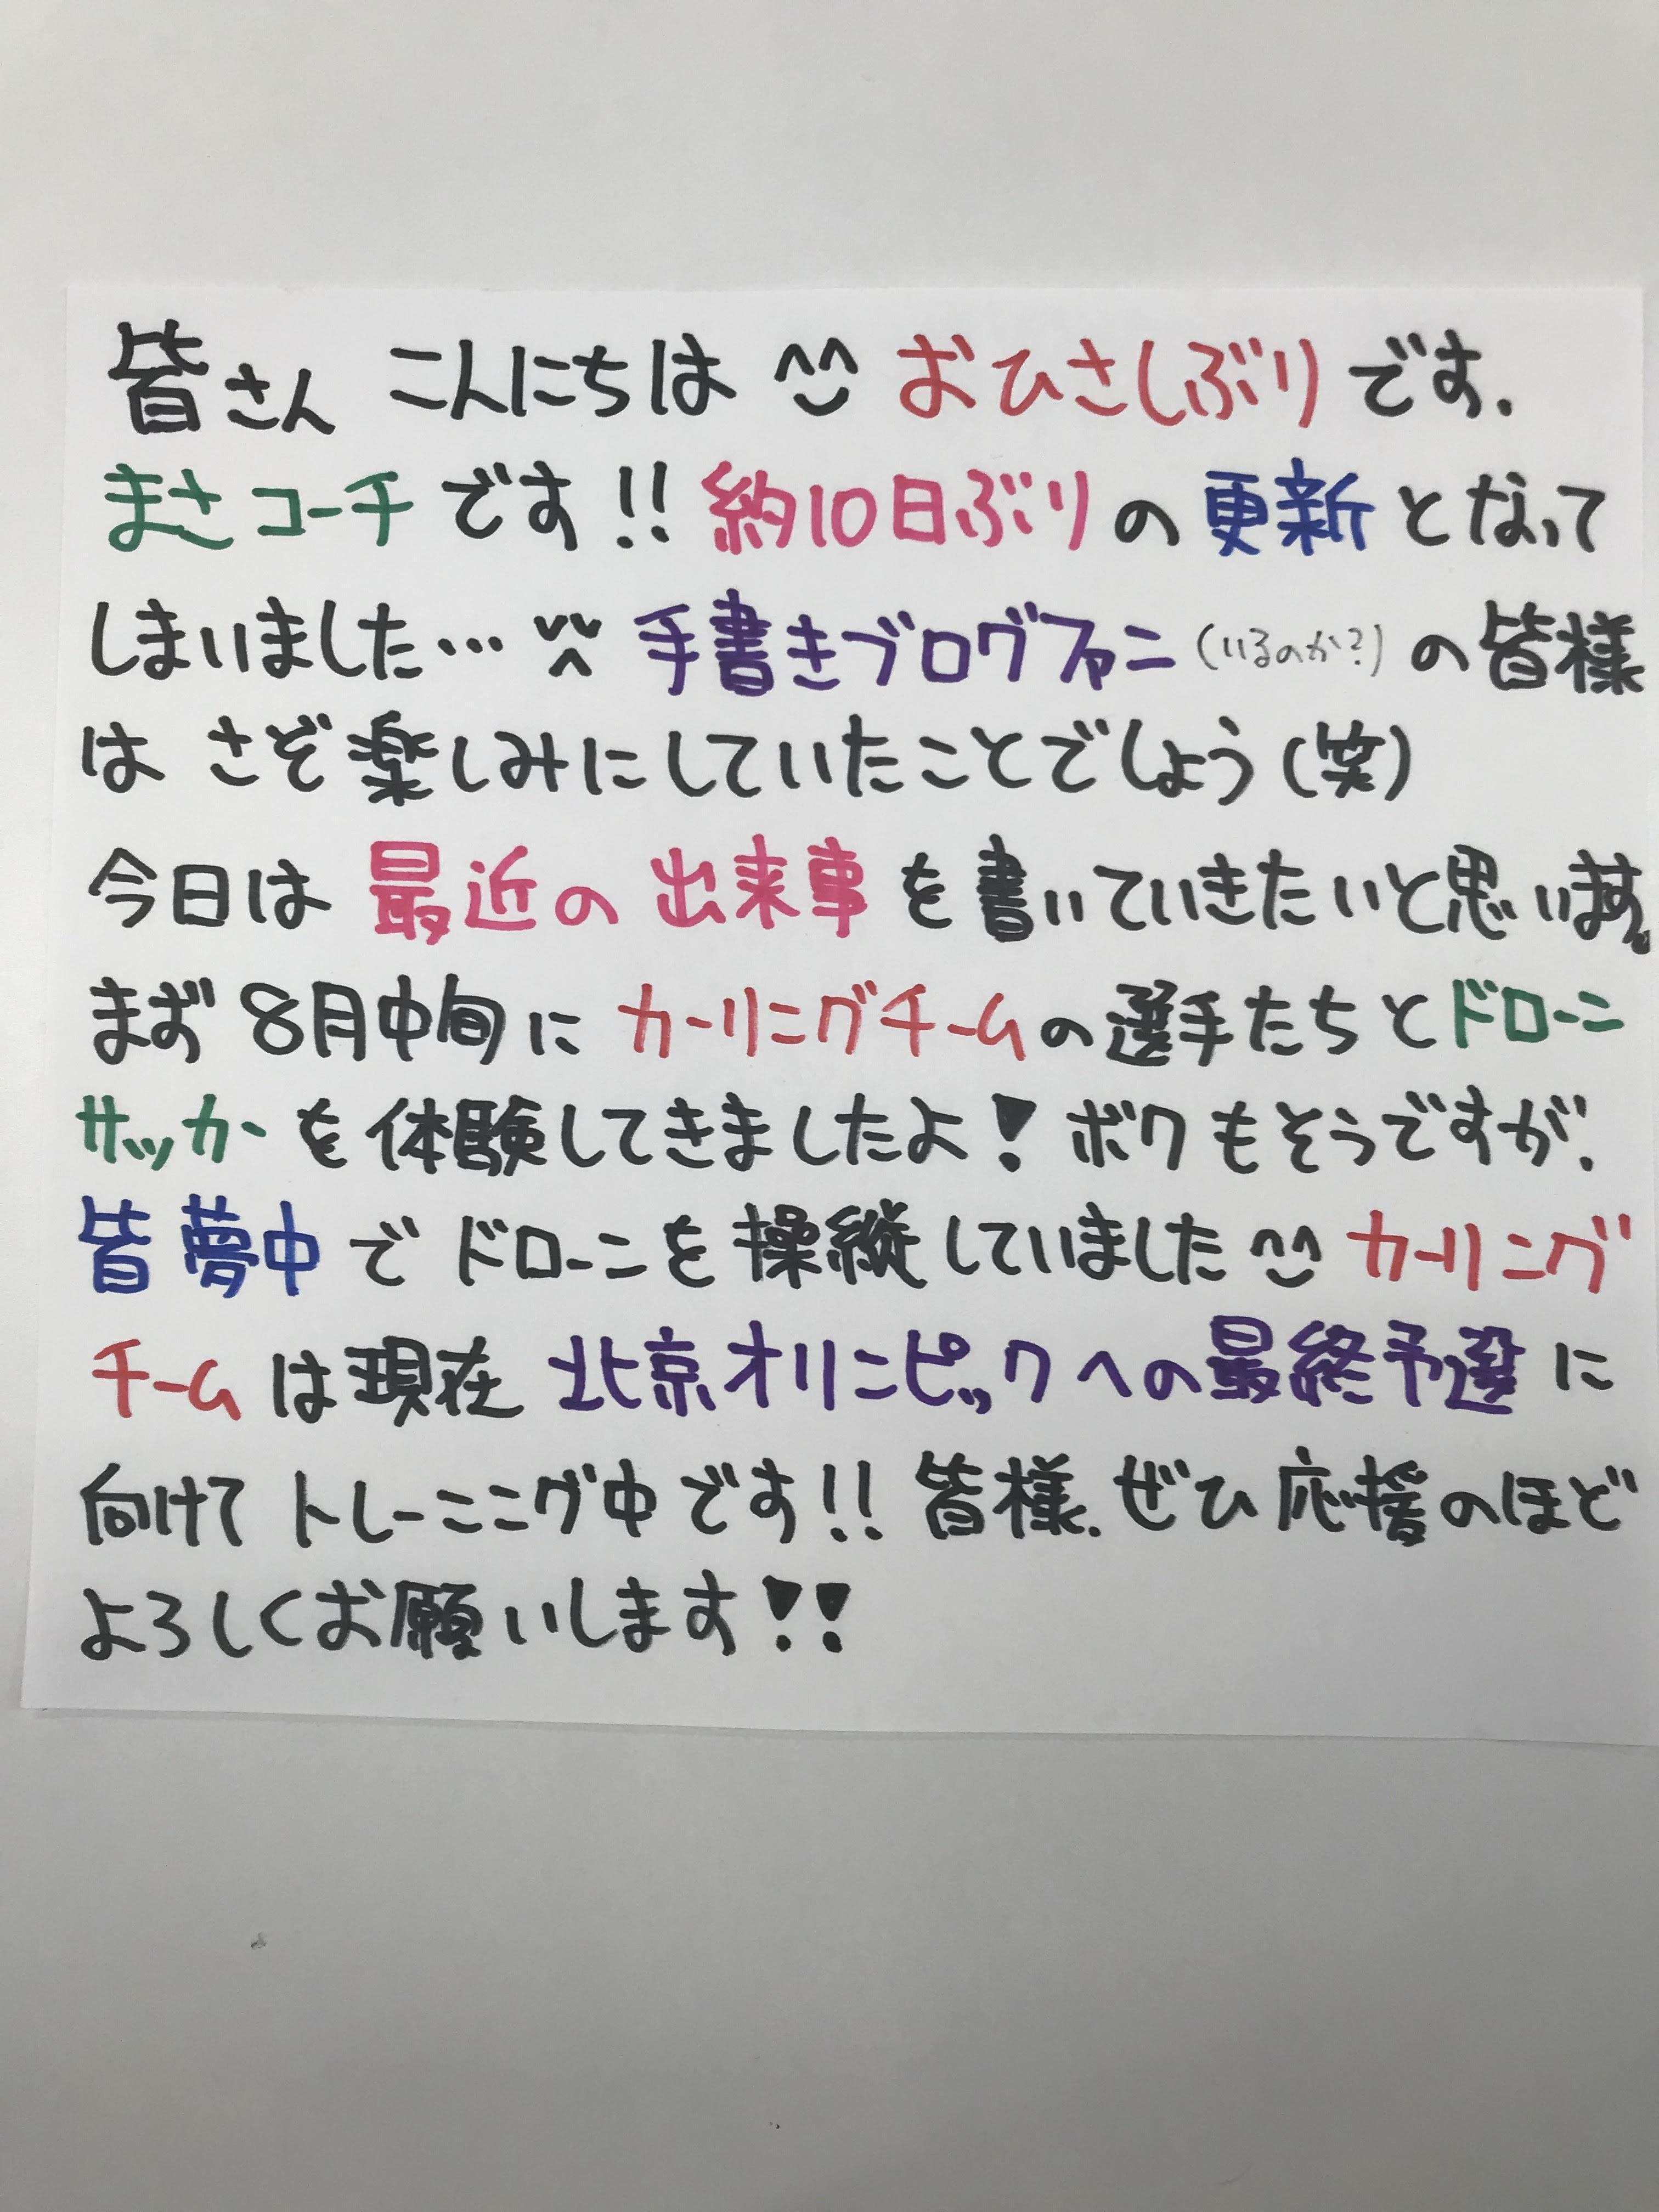 https://chsc.jp/news/up_images/%2331%281%29.jpg